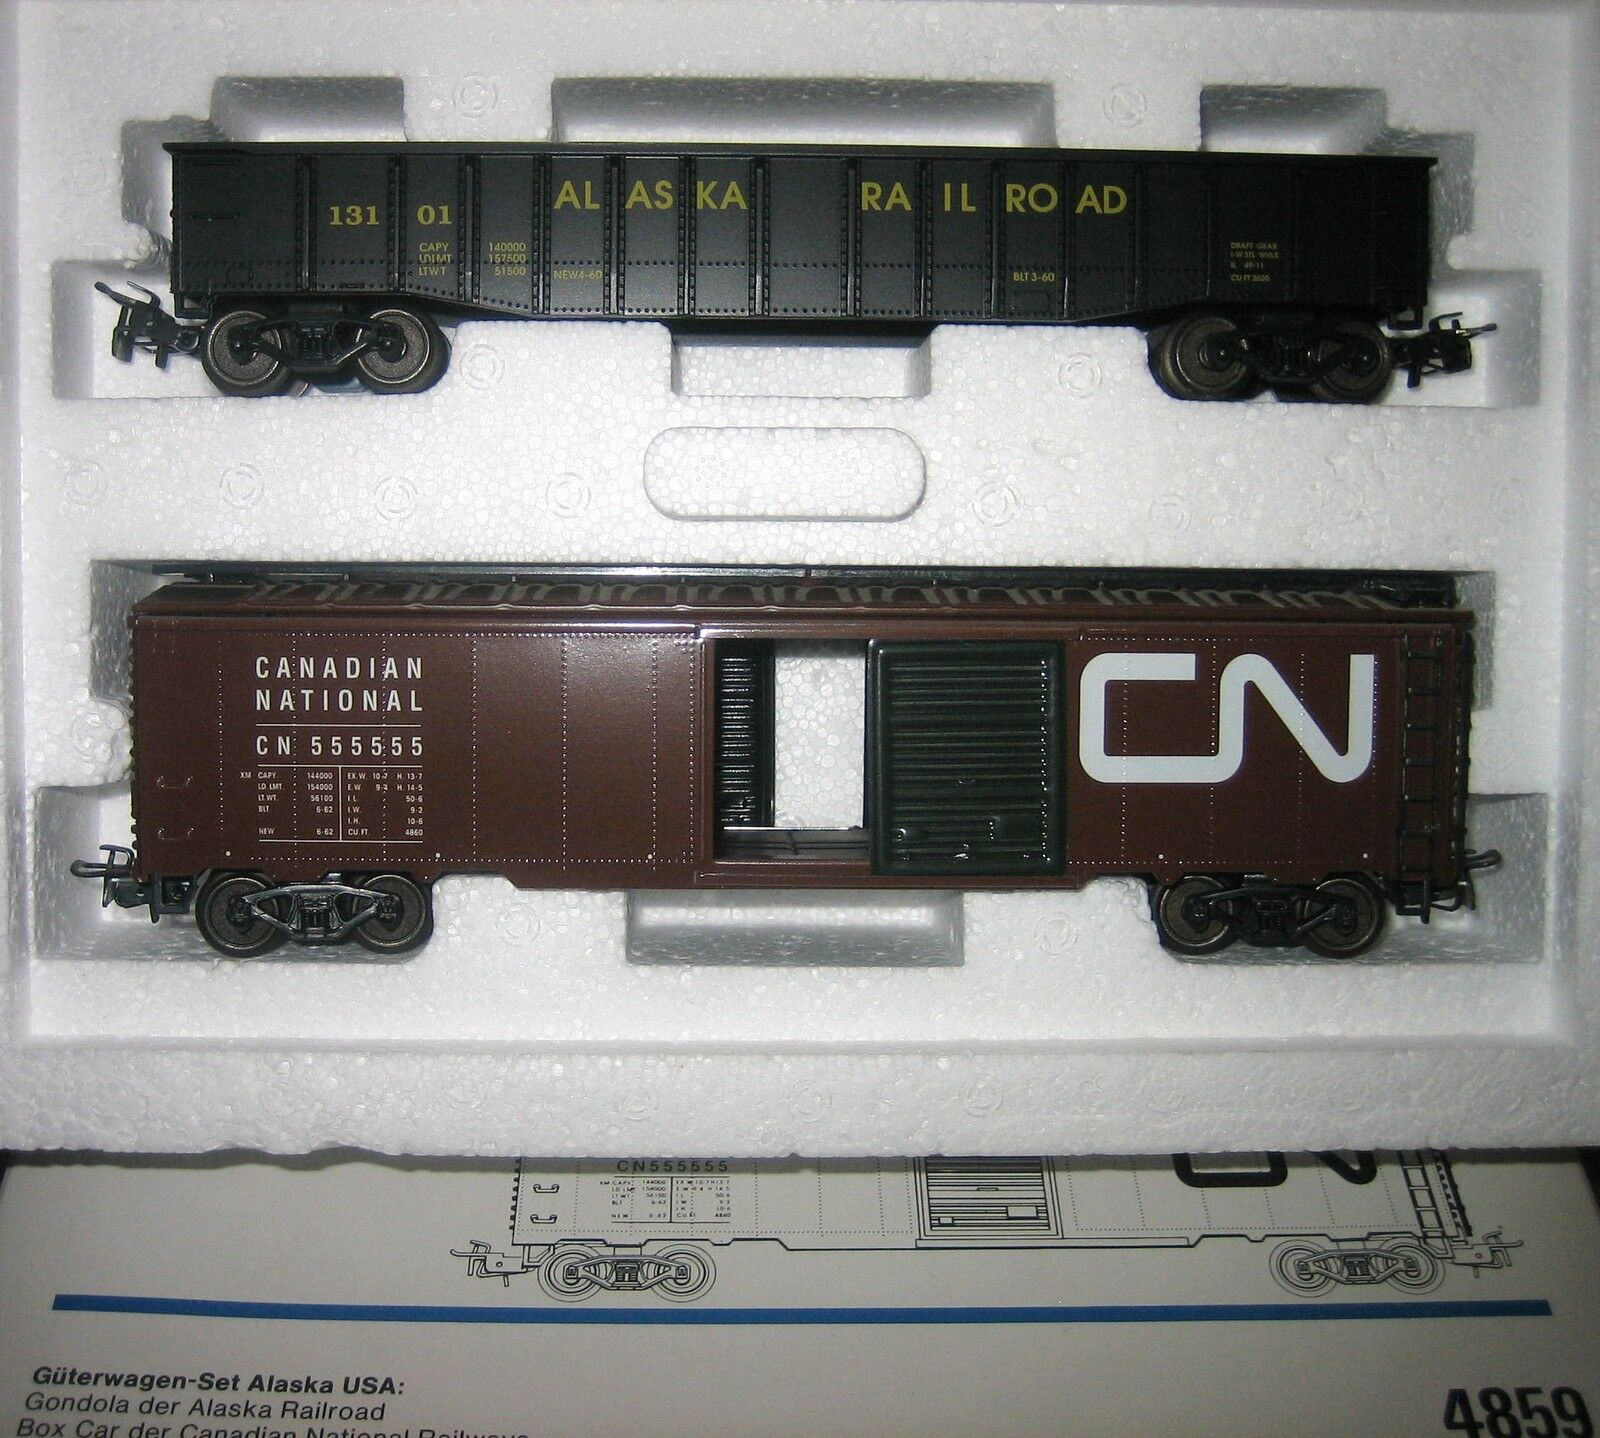 Märklin H0 4859 USA Freight Wagon Set Alaska to 3663 New Condition Original Box